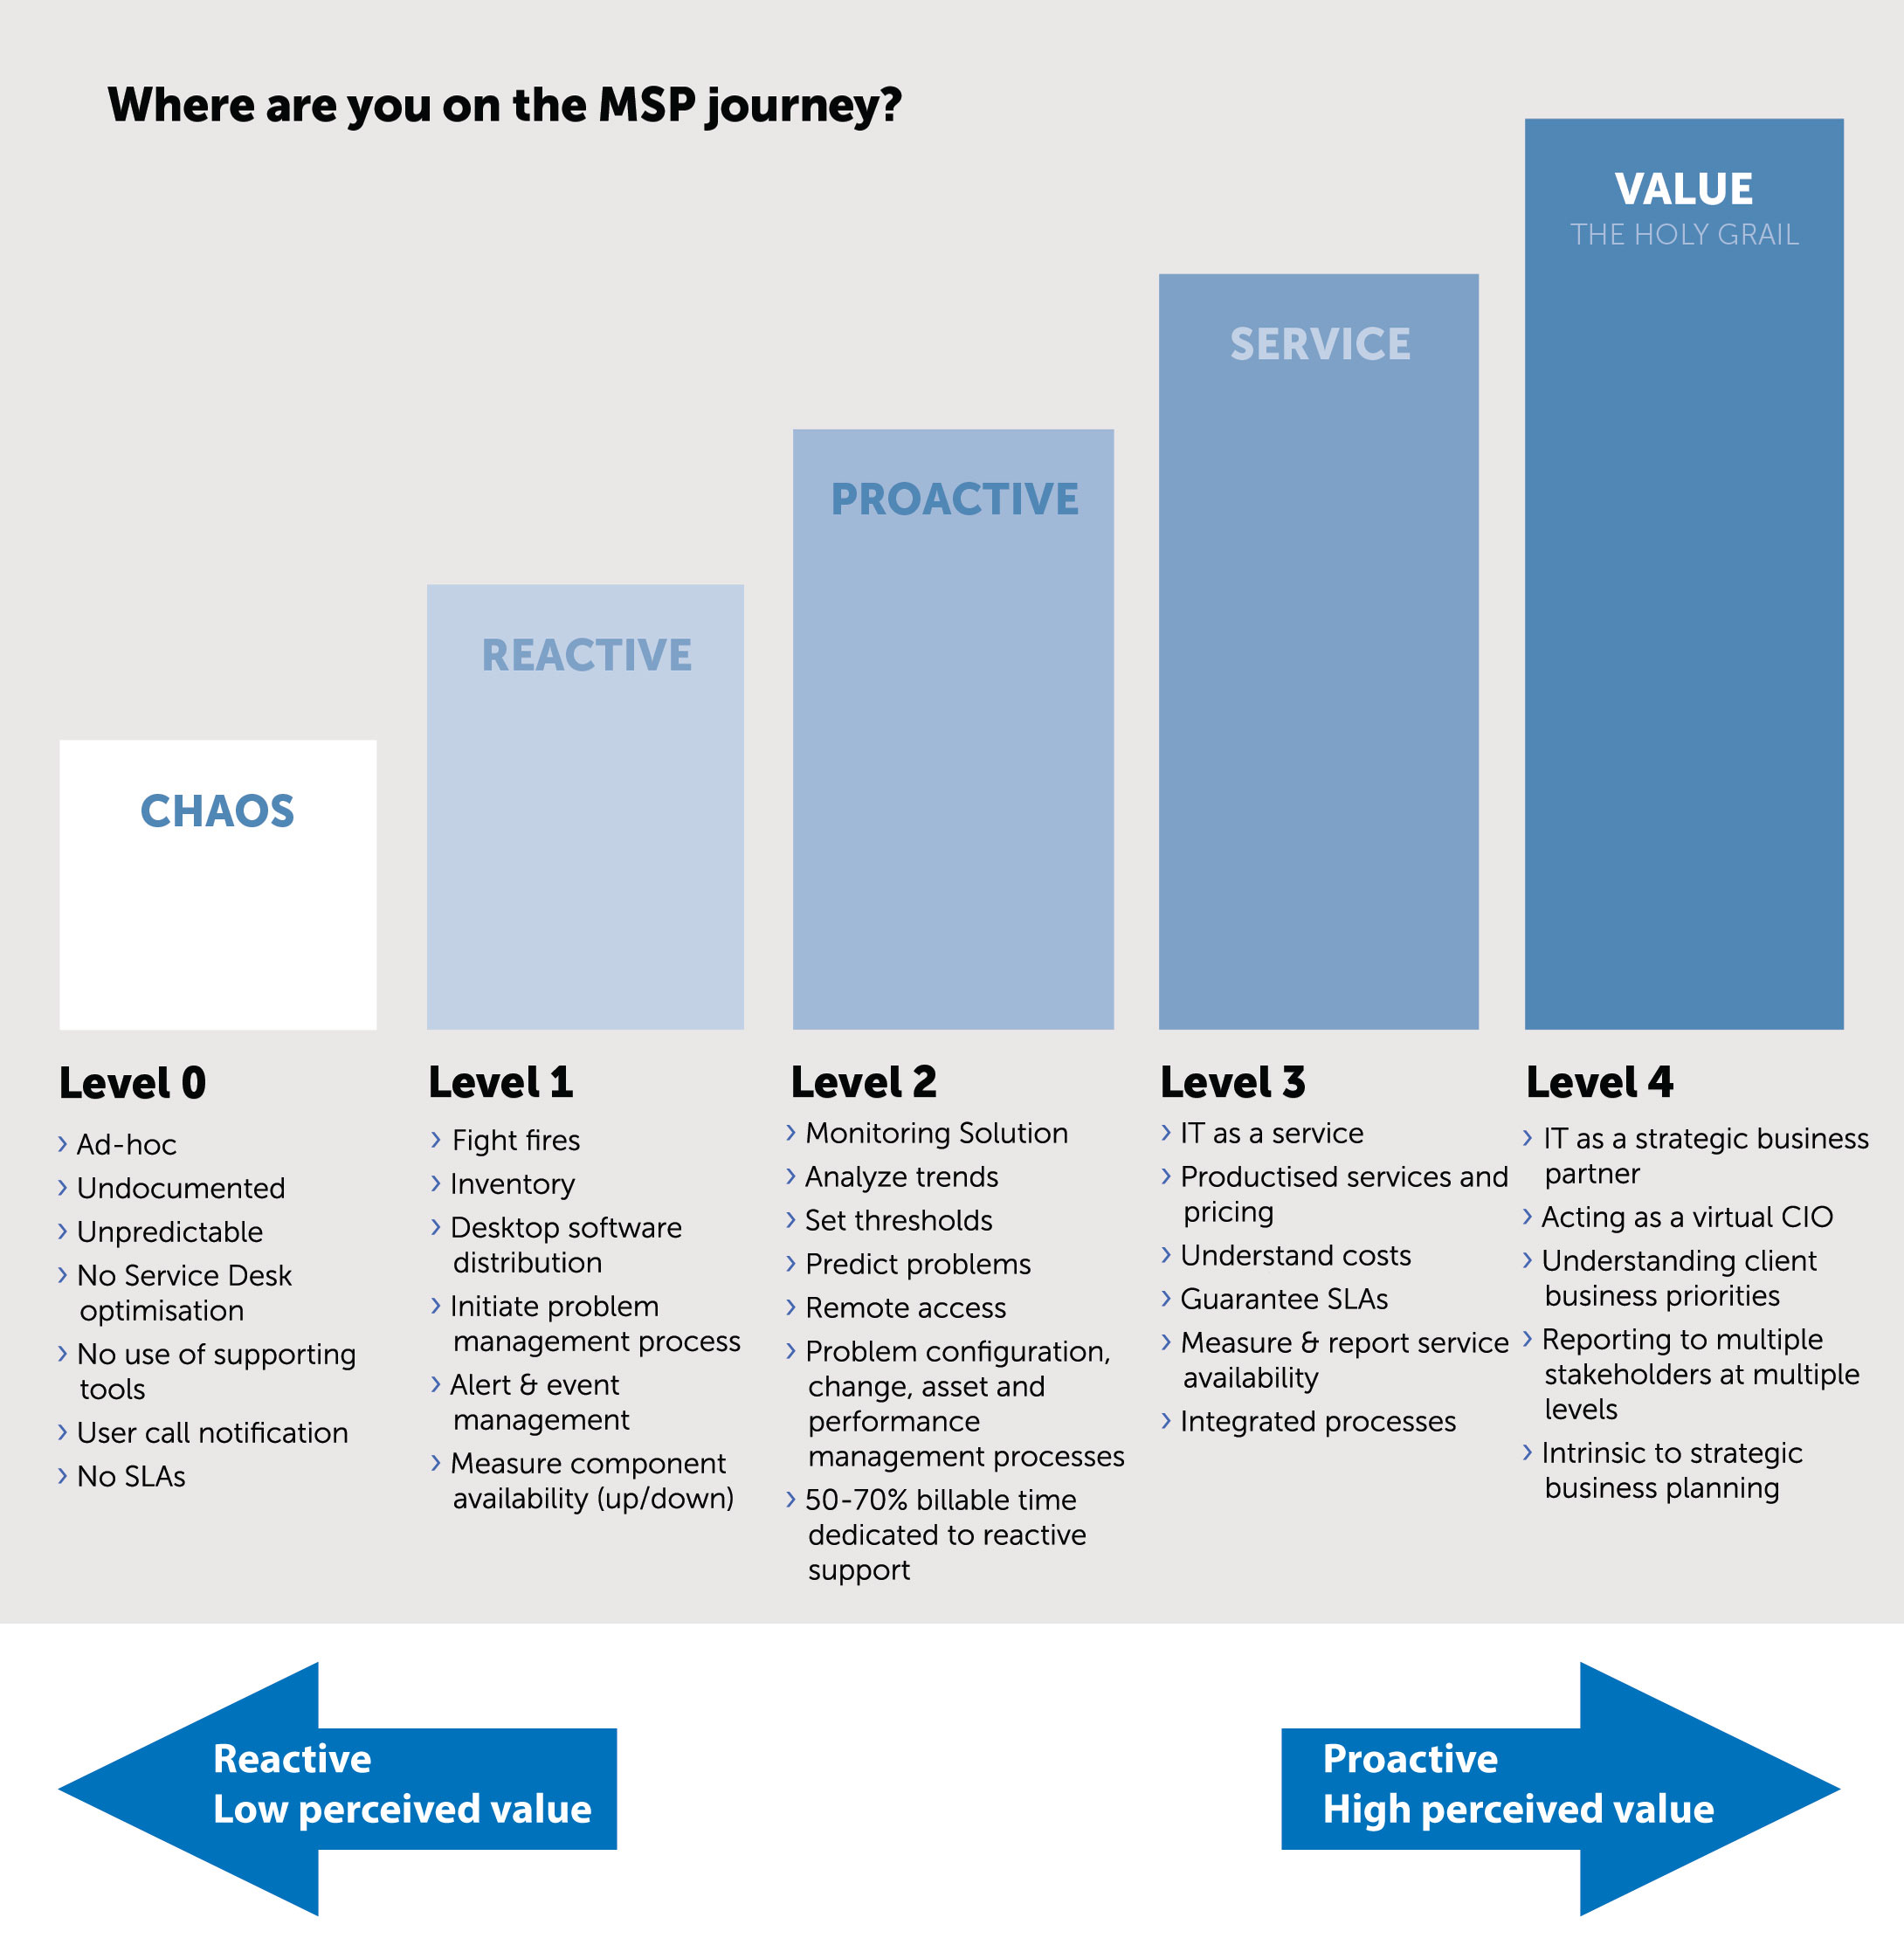 msp_journey_chart_2017